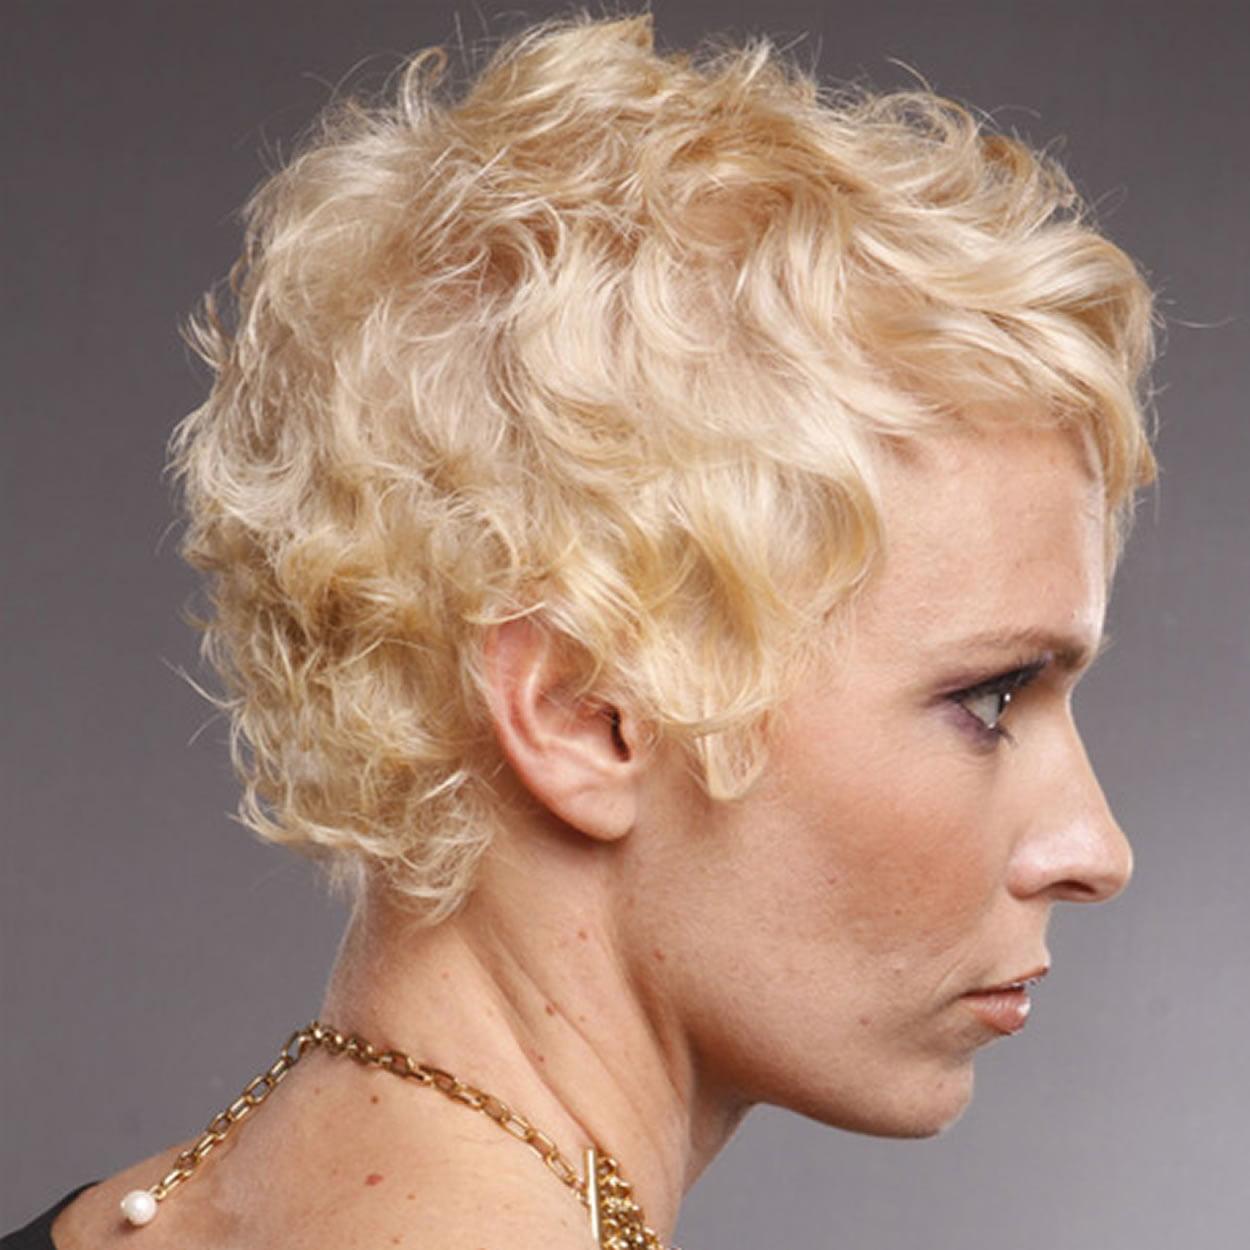 63 Unique Pixie & Bob Haircuts, Hairstyles for Short Hair ...